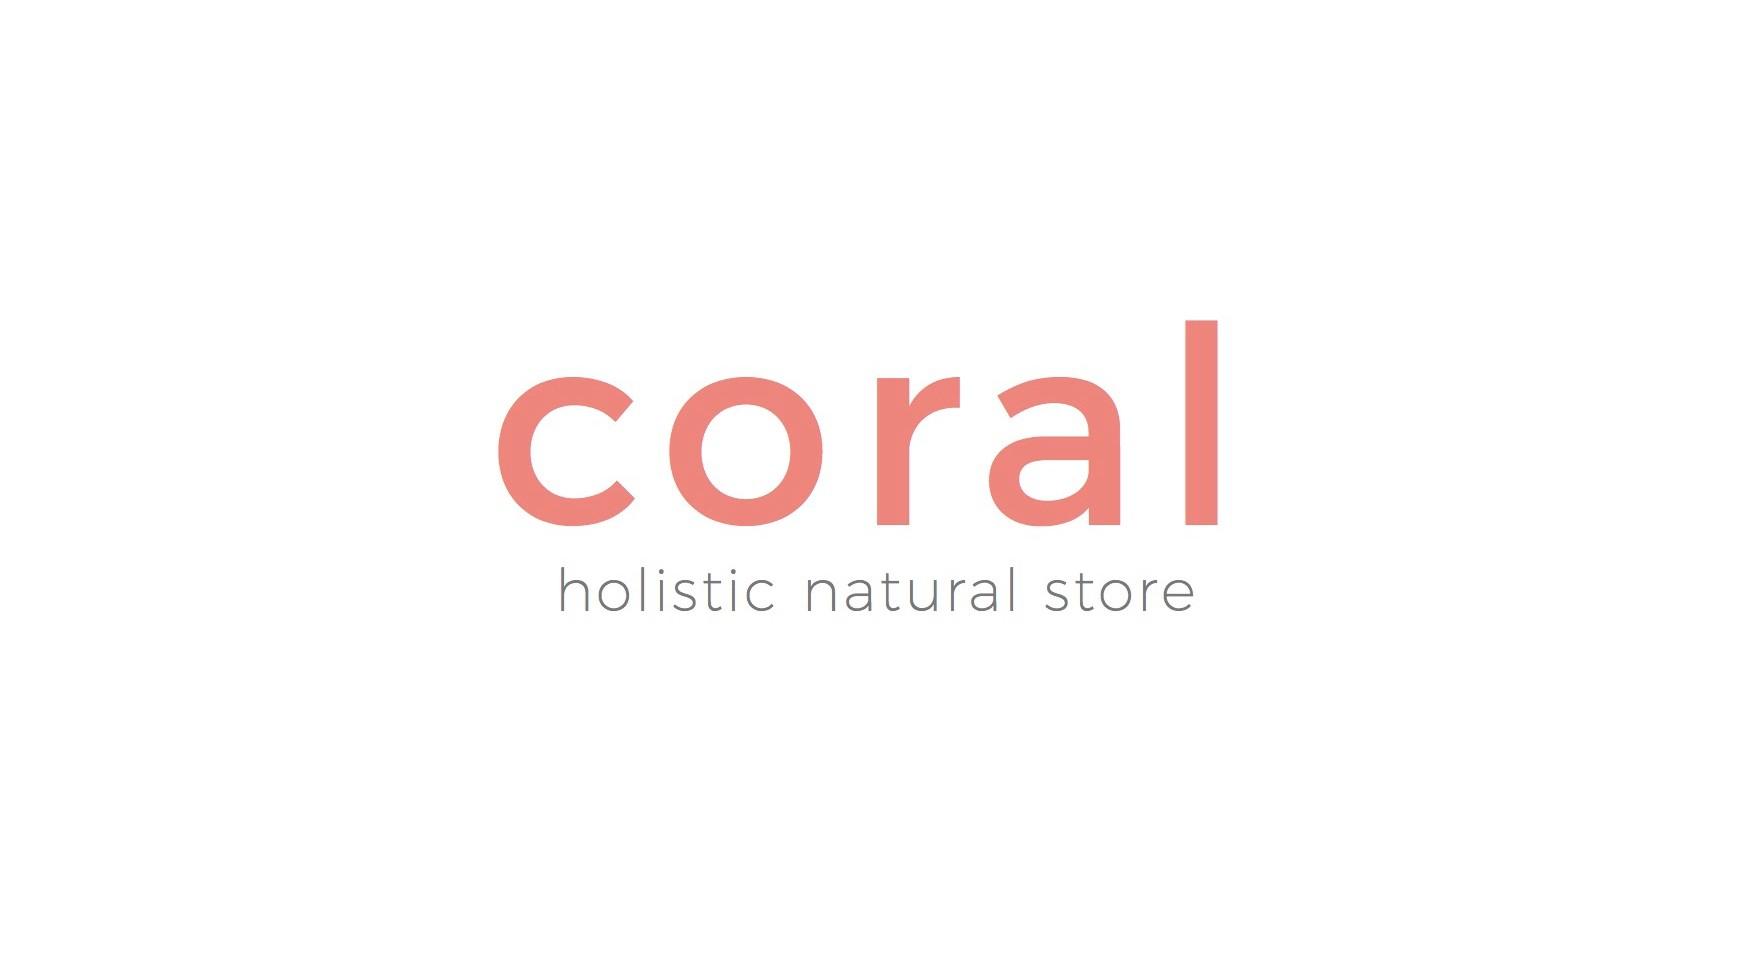 coral holistic natural store